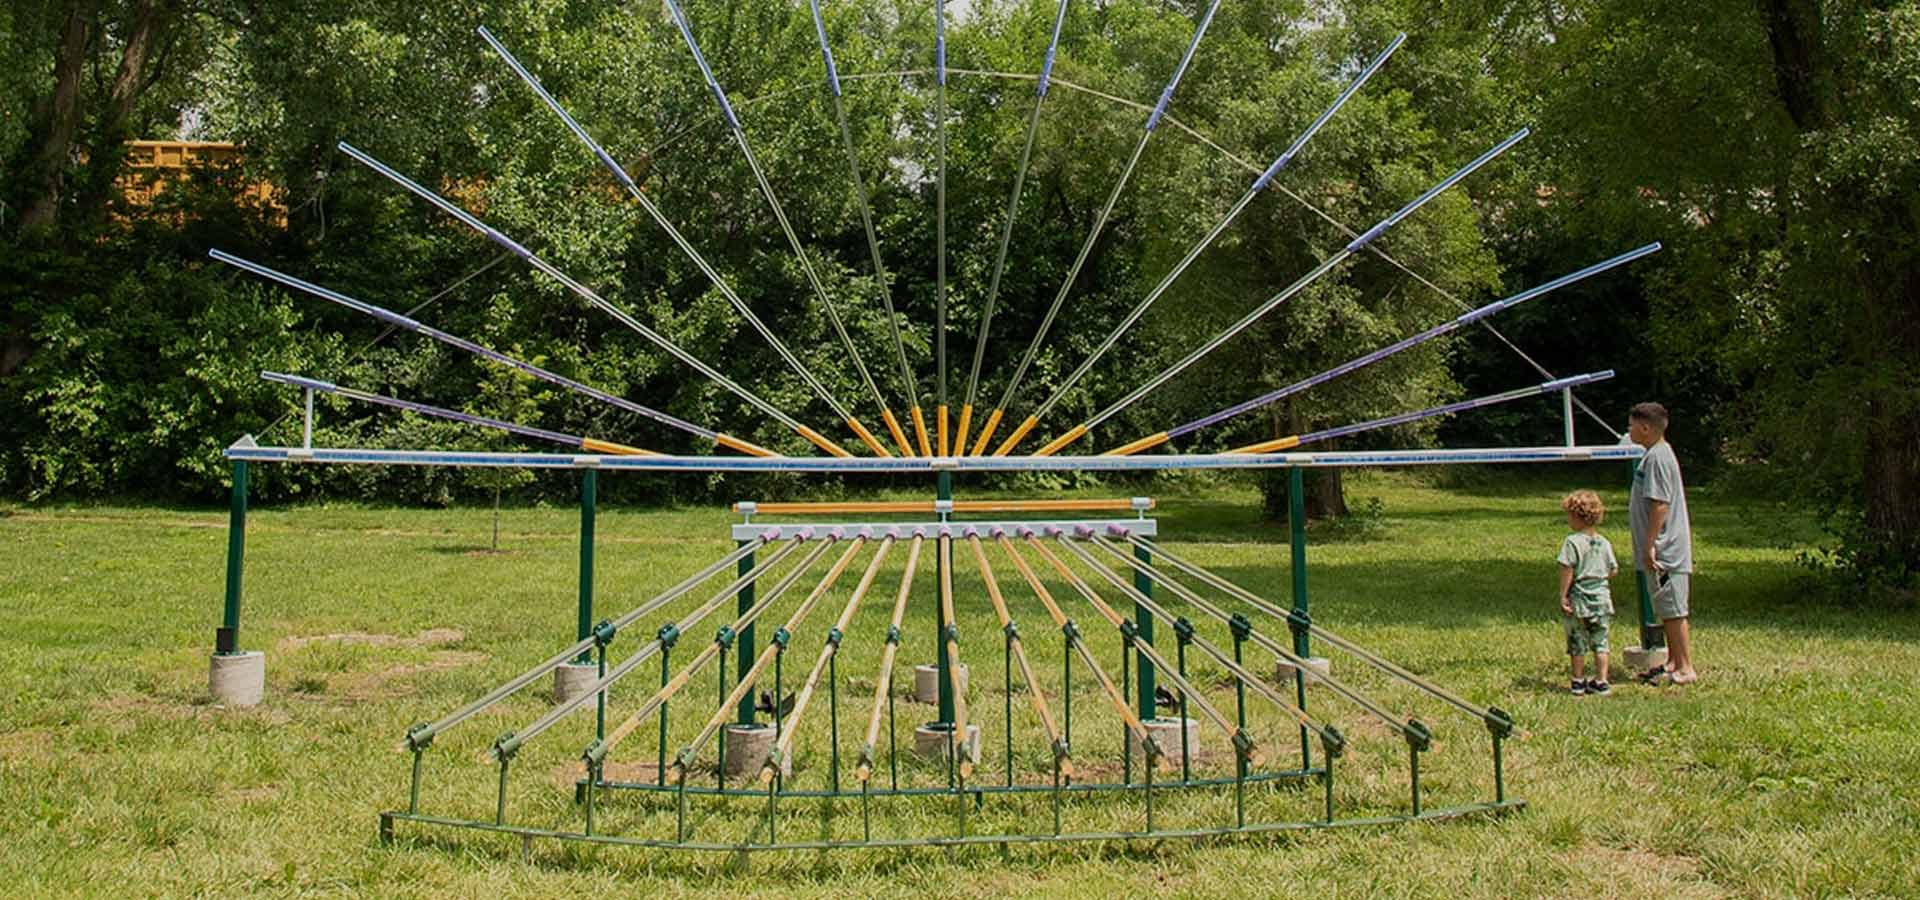 Experience Shelton Height's Park new art installation Bending Light!